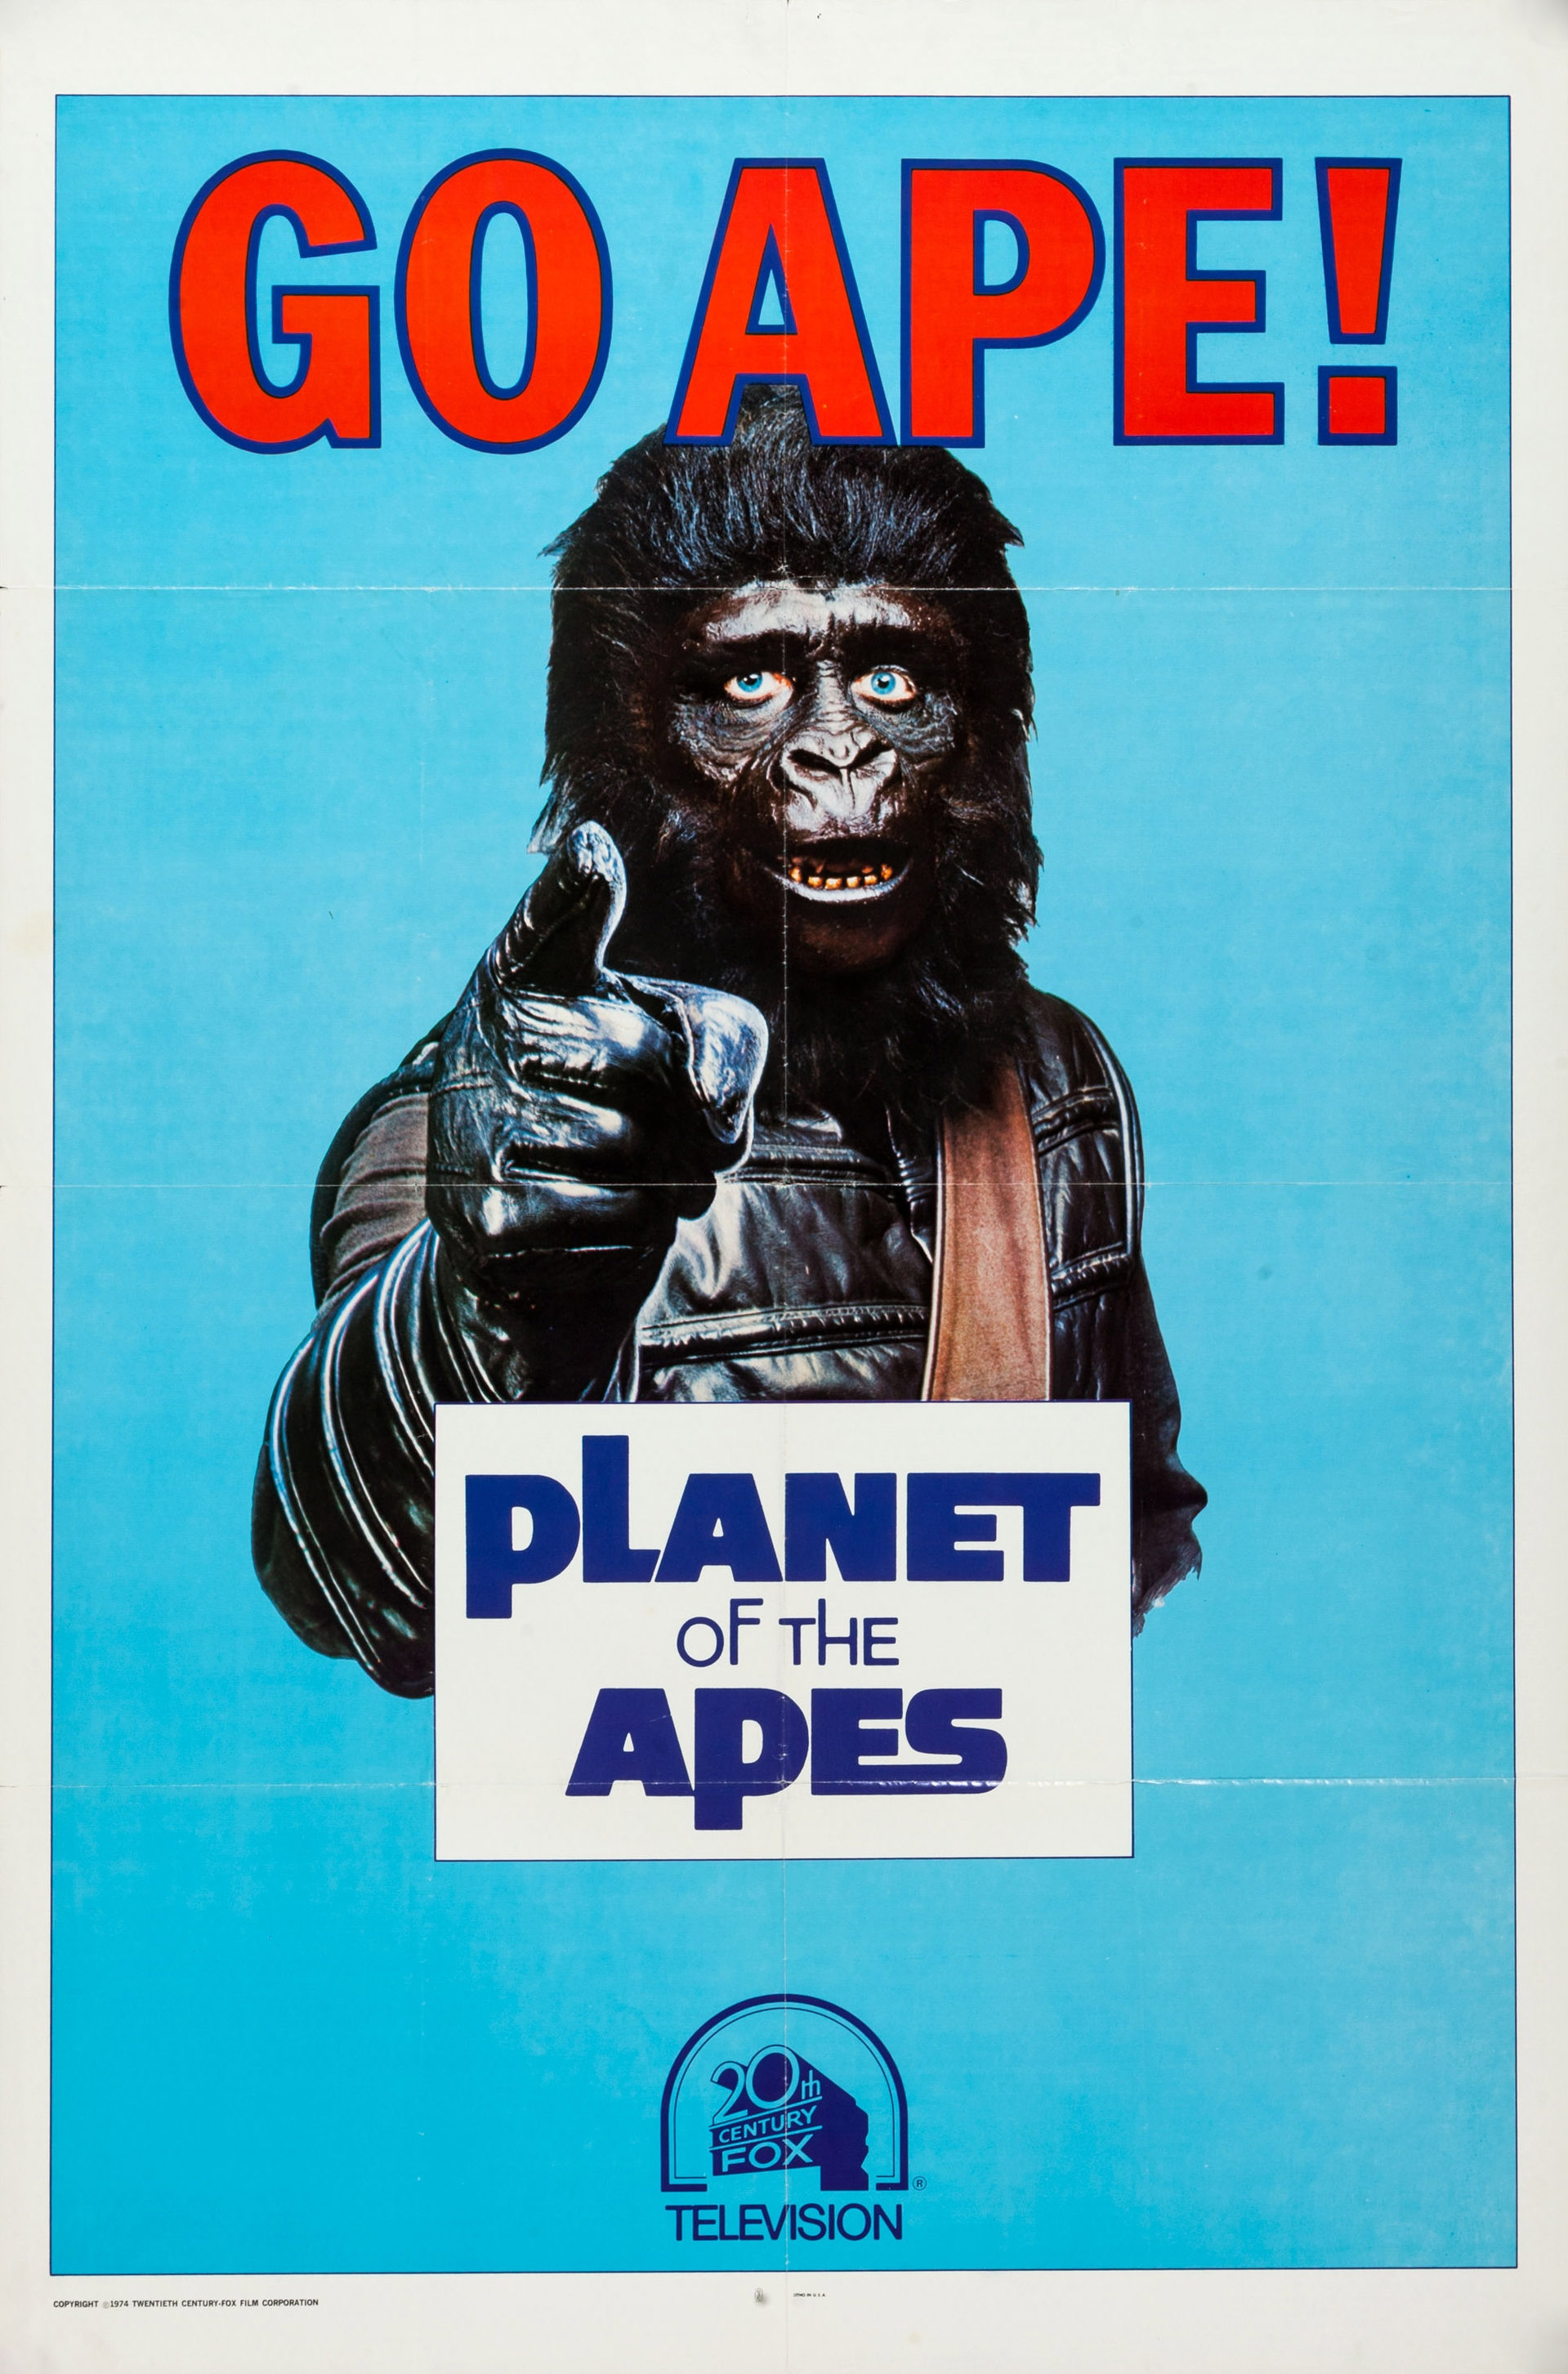 planet of the apes v2 retro movie posterretro movie poster